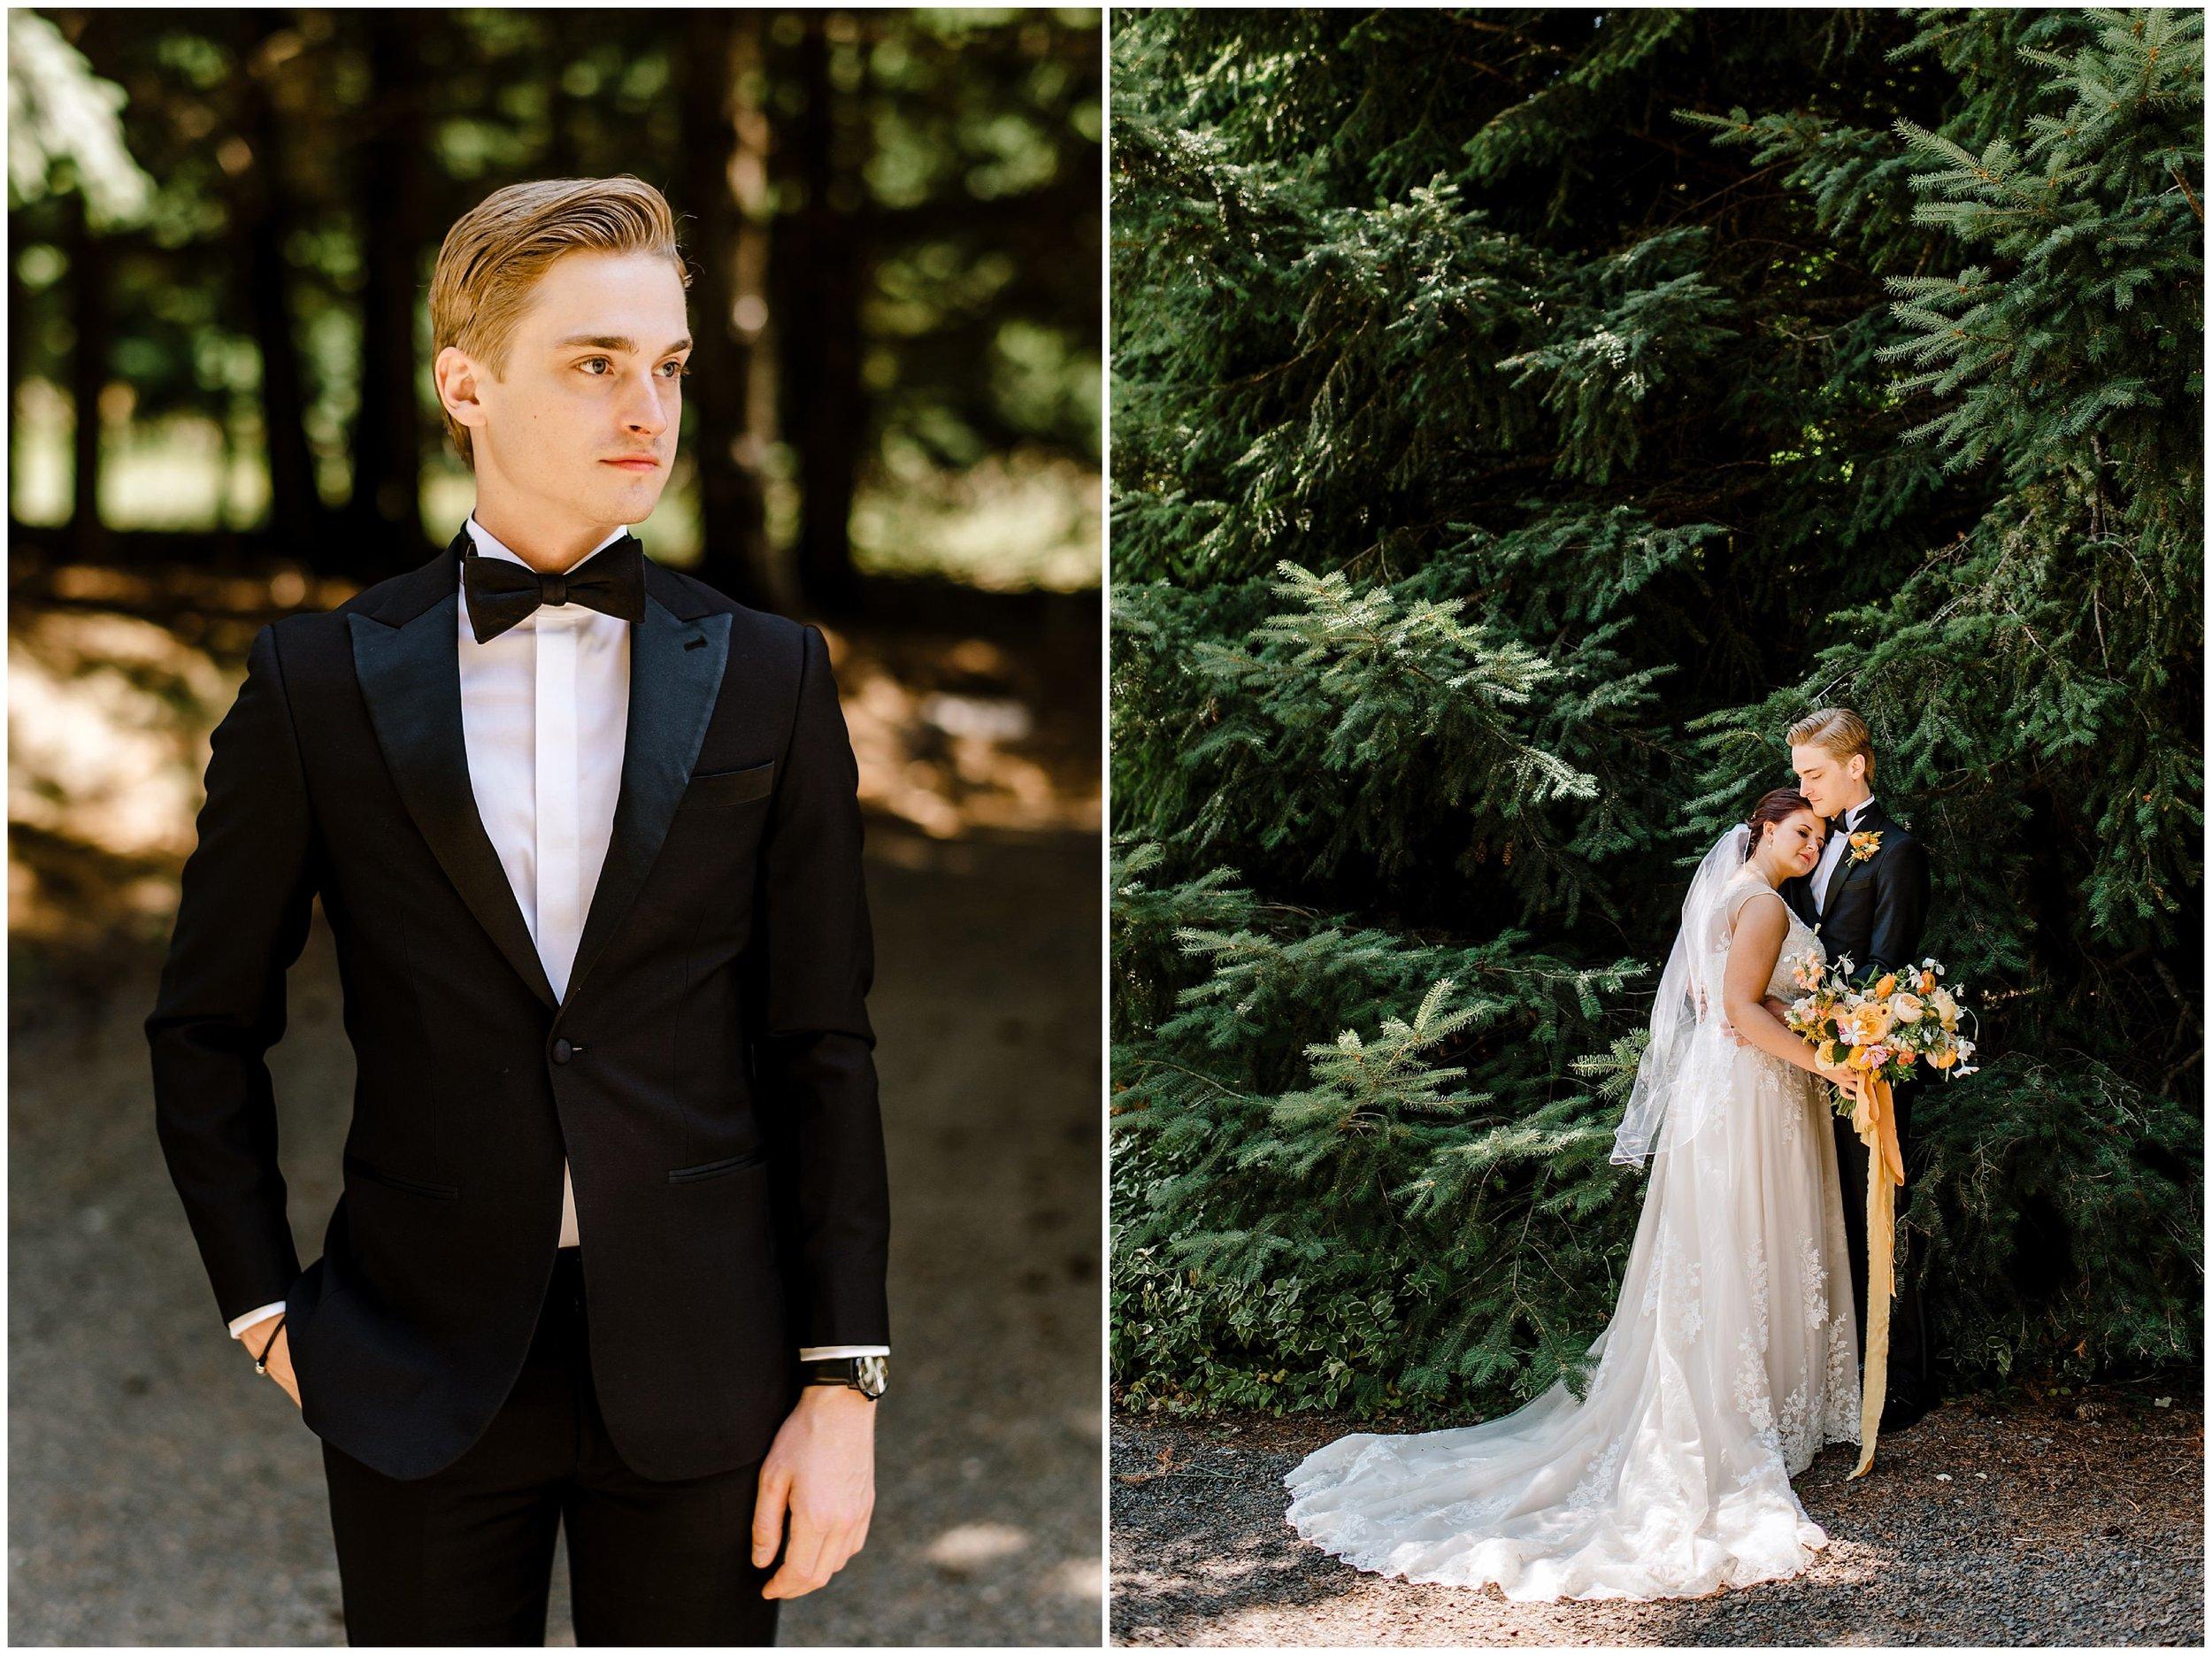 Citrus-inspired-wedding-at-Gorge-Crest-Vineyard-213.jpg